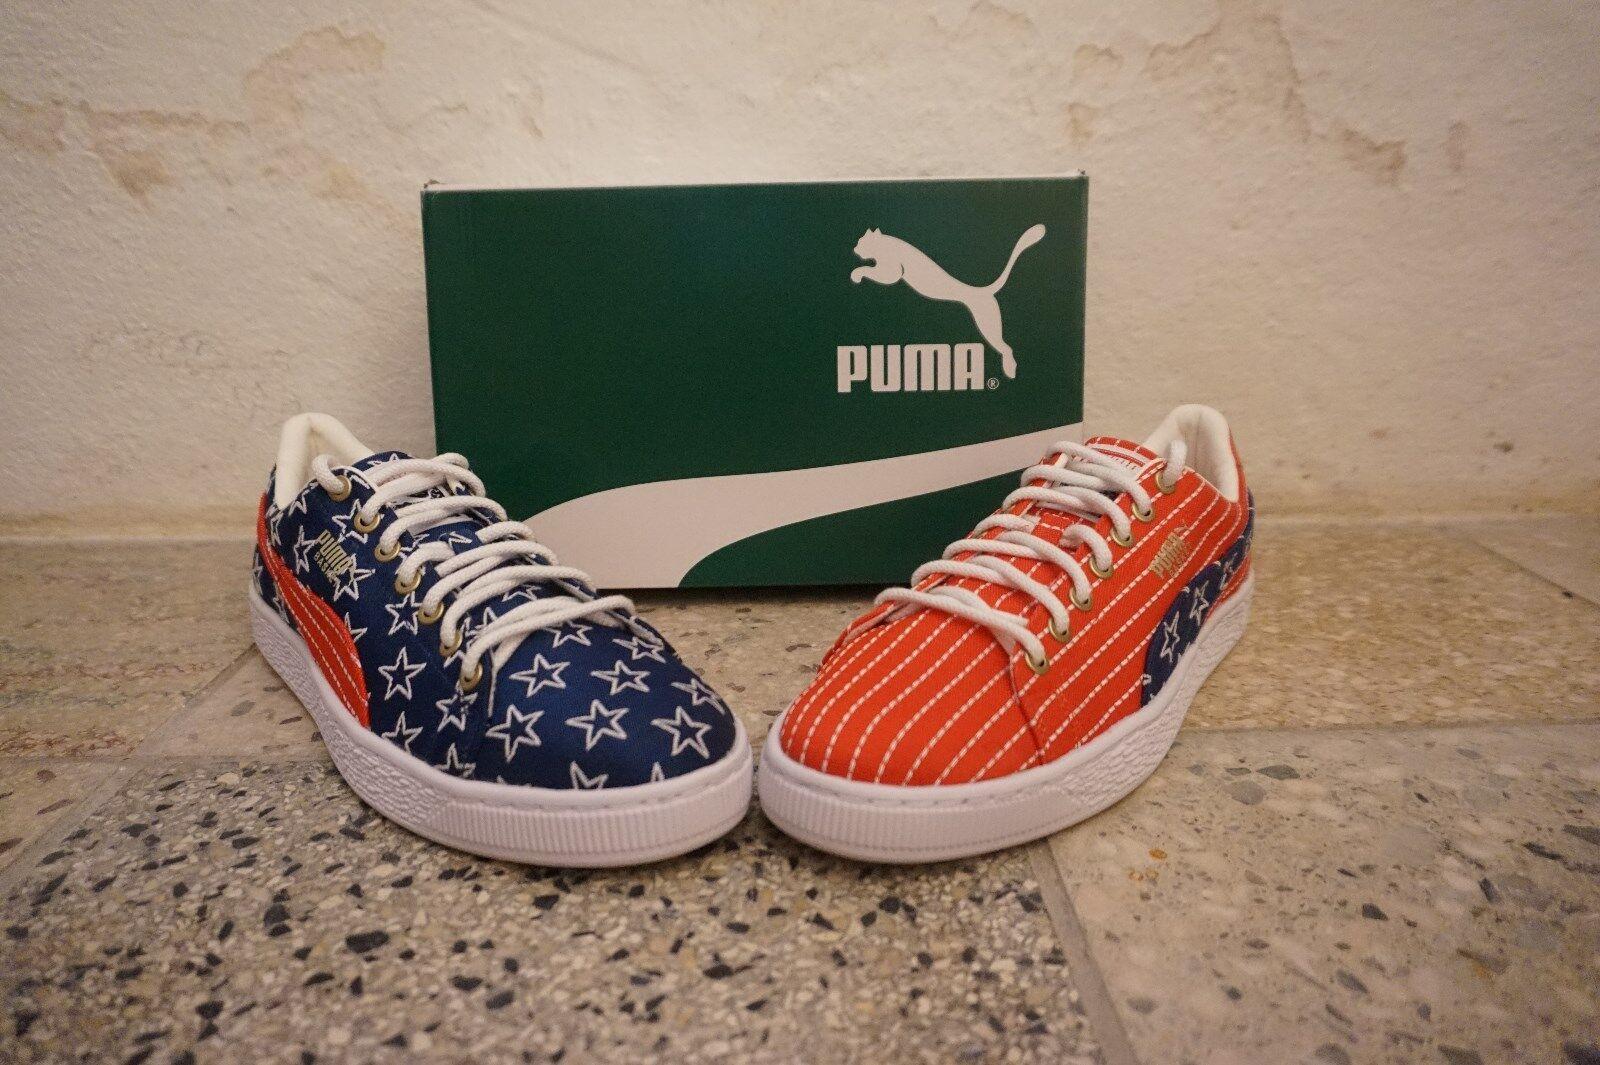 newest ad800 b73c8 Puma Basket 4th of July-NEUF-NEW-ORIGINAL - doubleboxed-UE 42-US 42-US 42-US  9 26c3ca